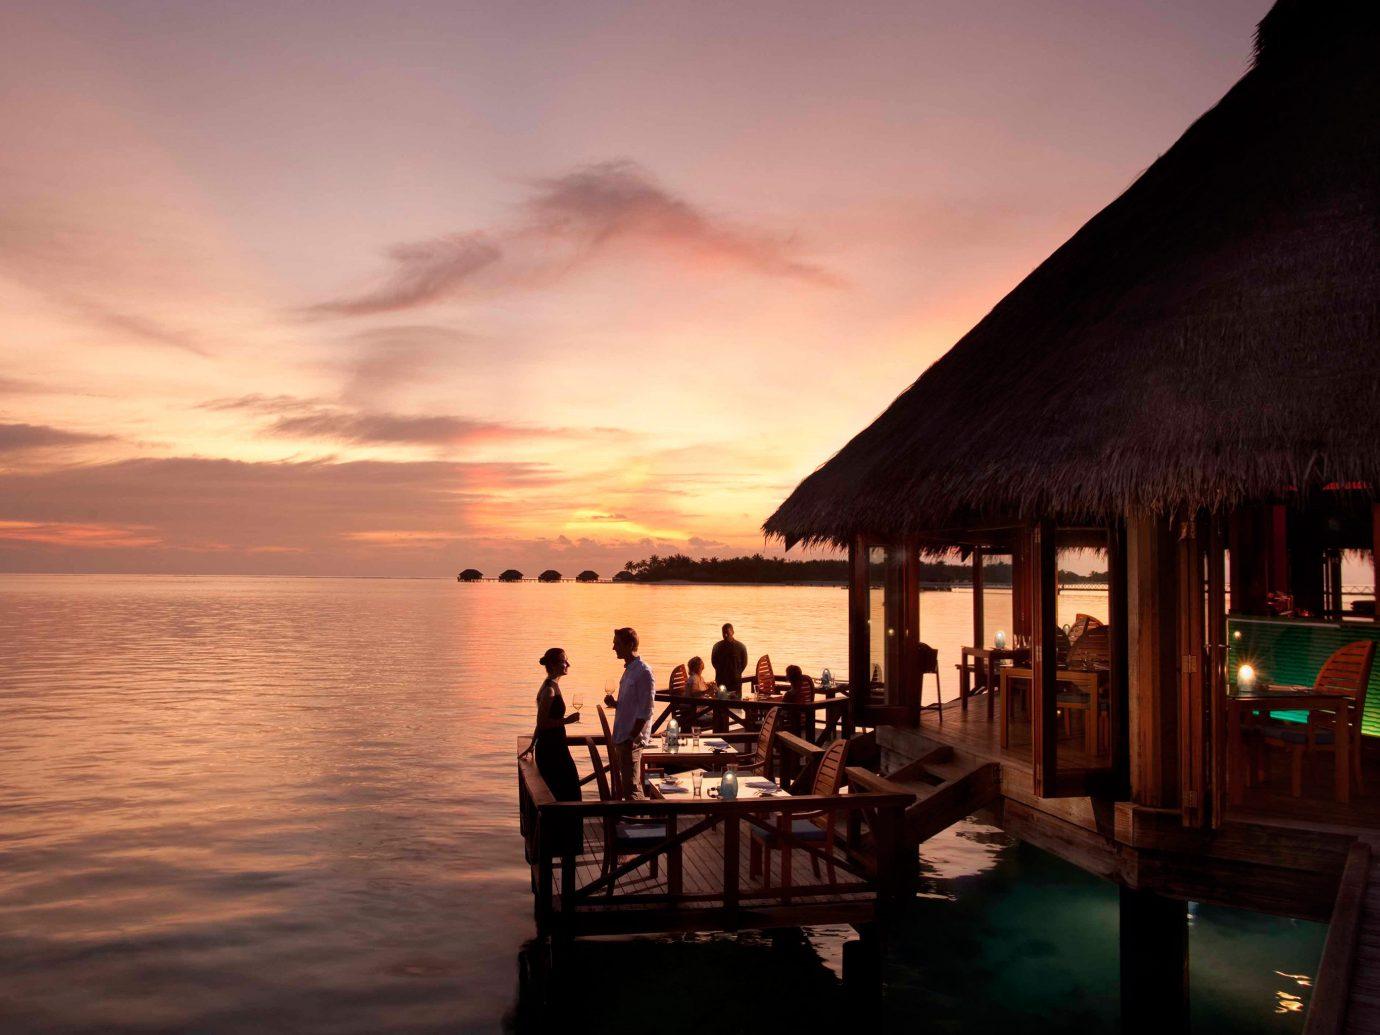 Conrad Maldives Rangali Island at night